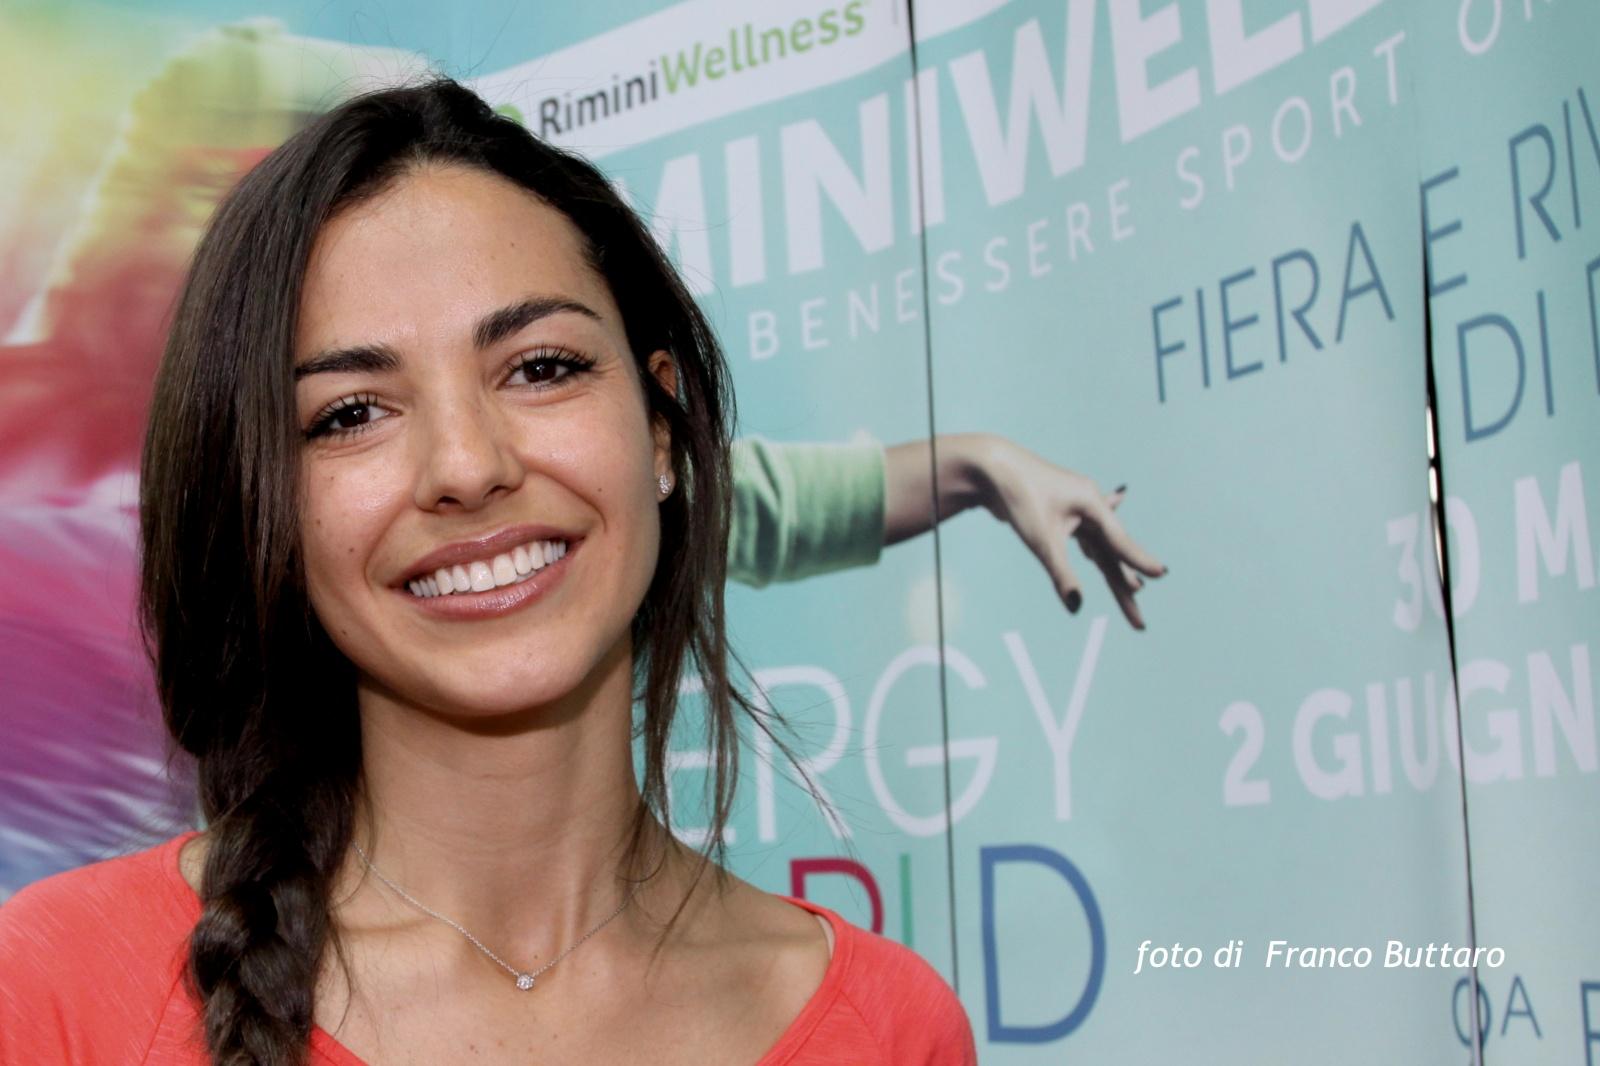 Rimini Wellness 2014 - Laura Barriales